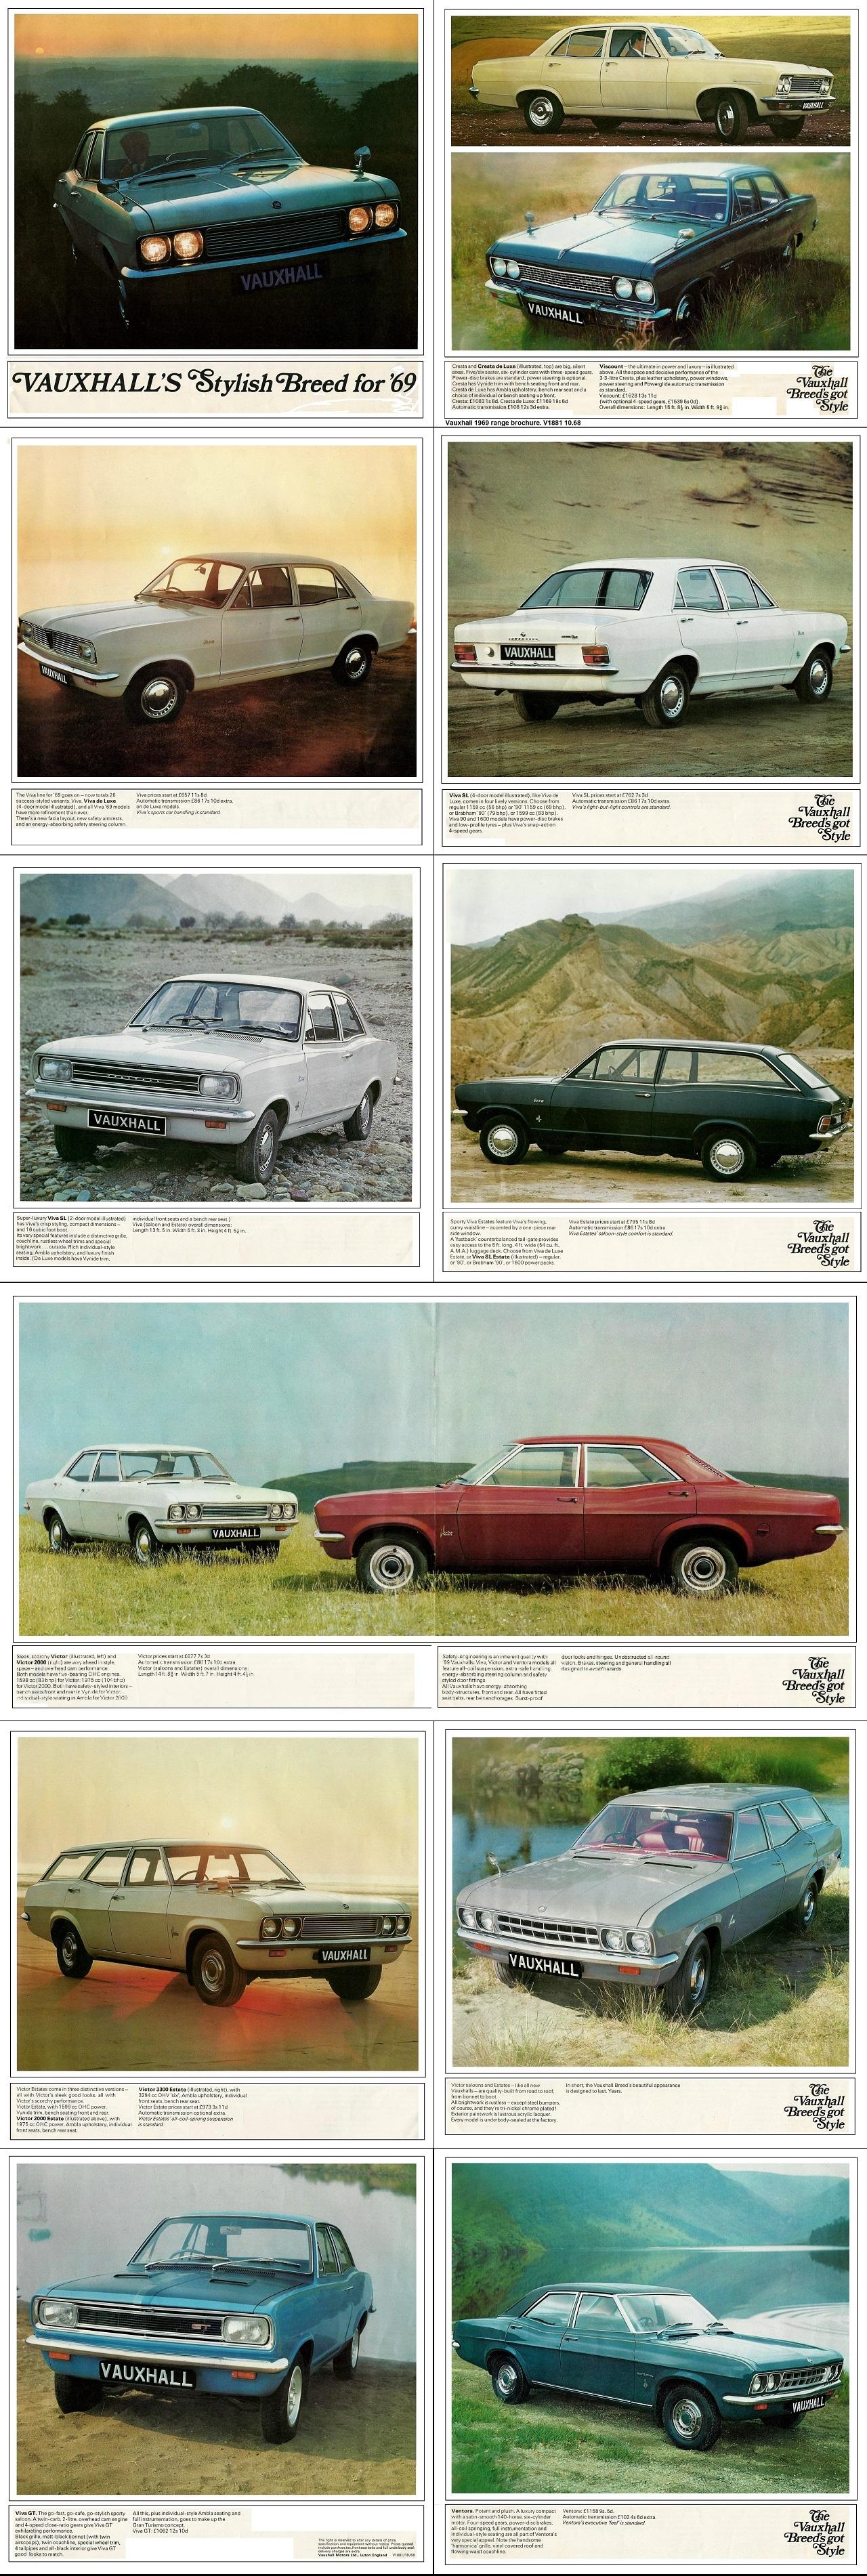 1967 Vauxhalls Vauxhall Across The Years Pinterest Cars